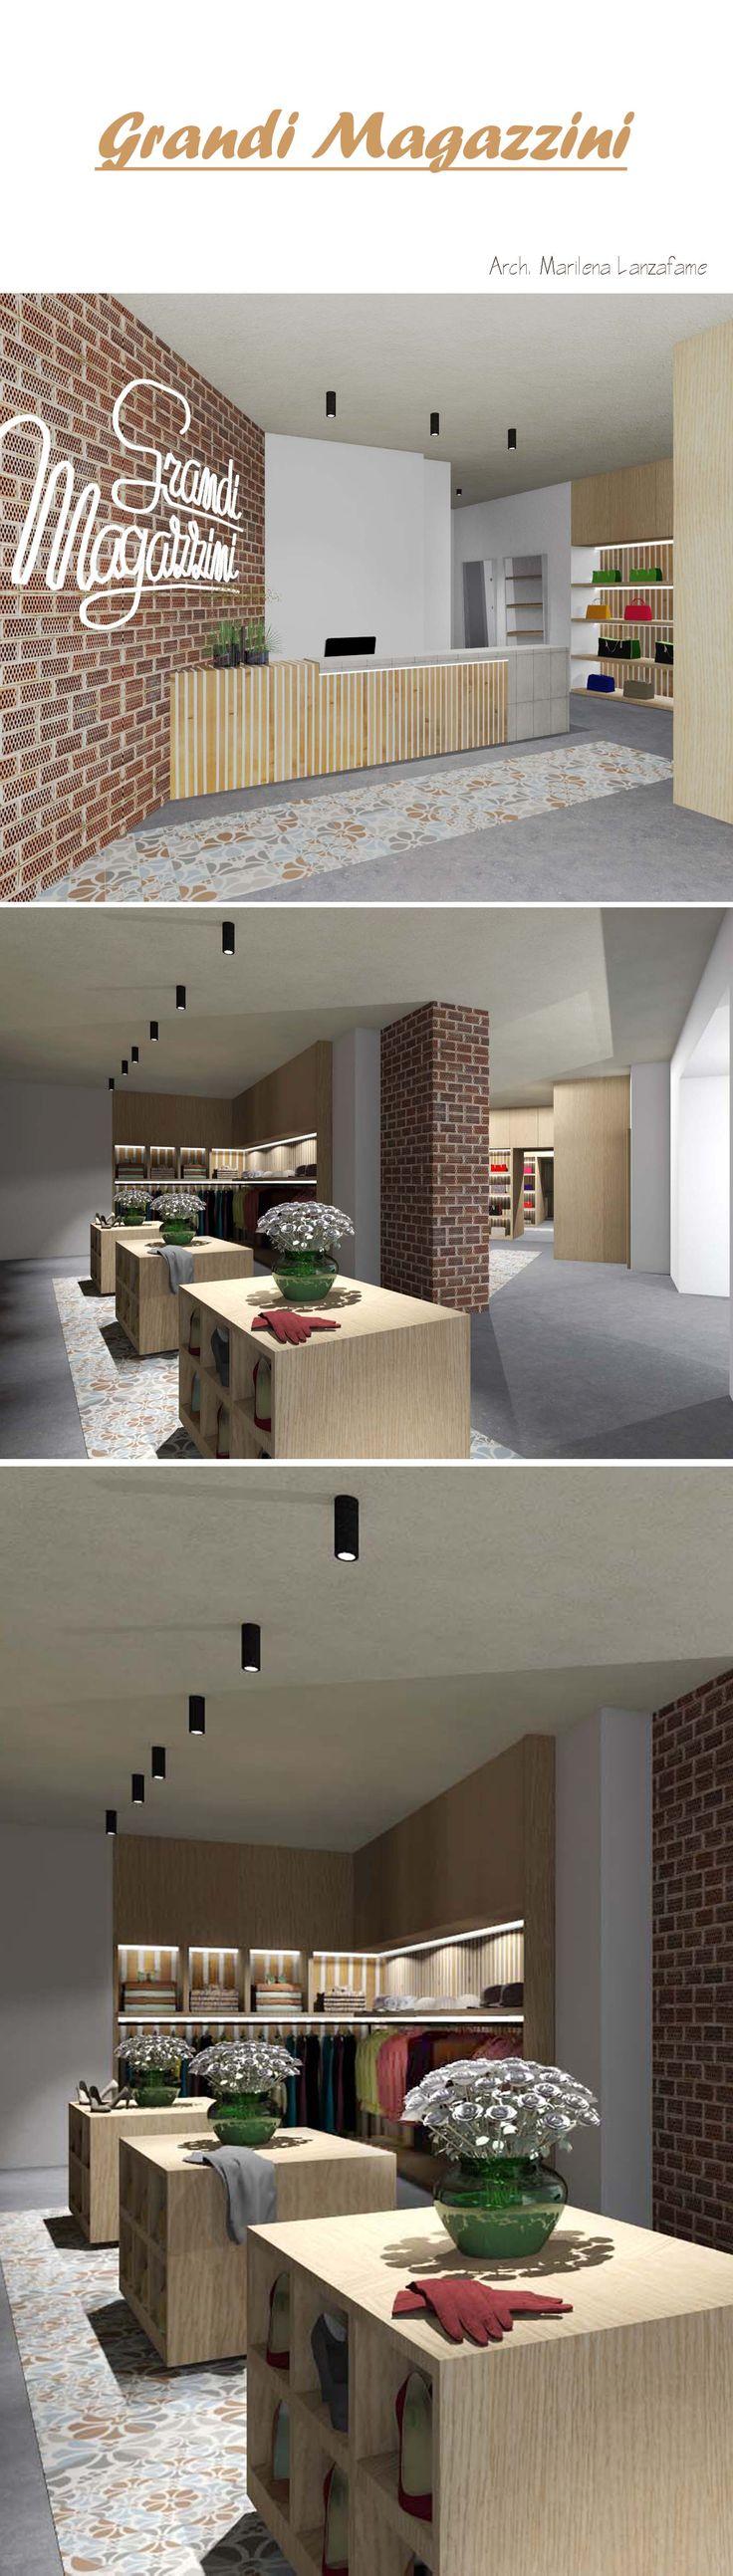 #archMLanzafame #myproject #architecture #design #interiordesign #shop #store #wood #brick #concrete #light #neon #atmosphere